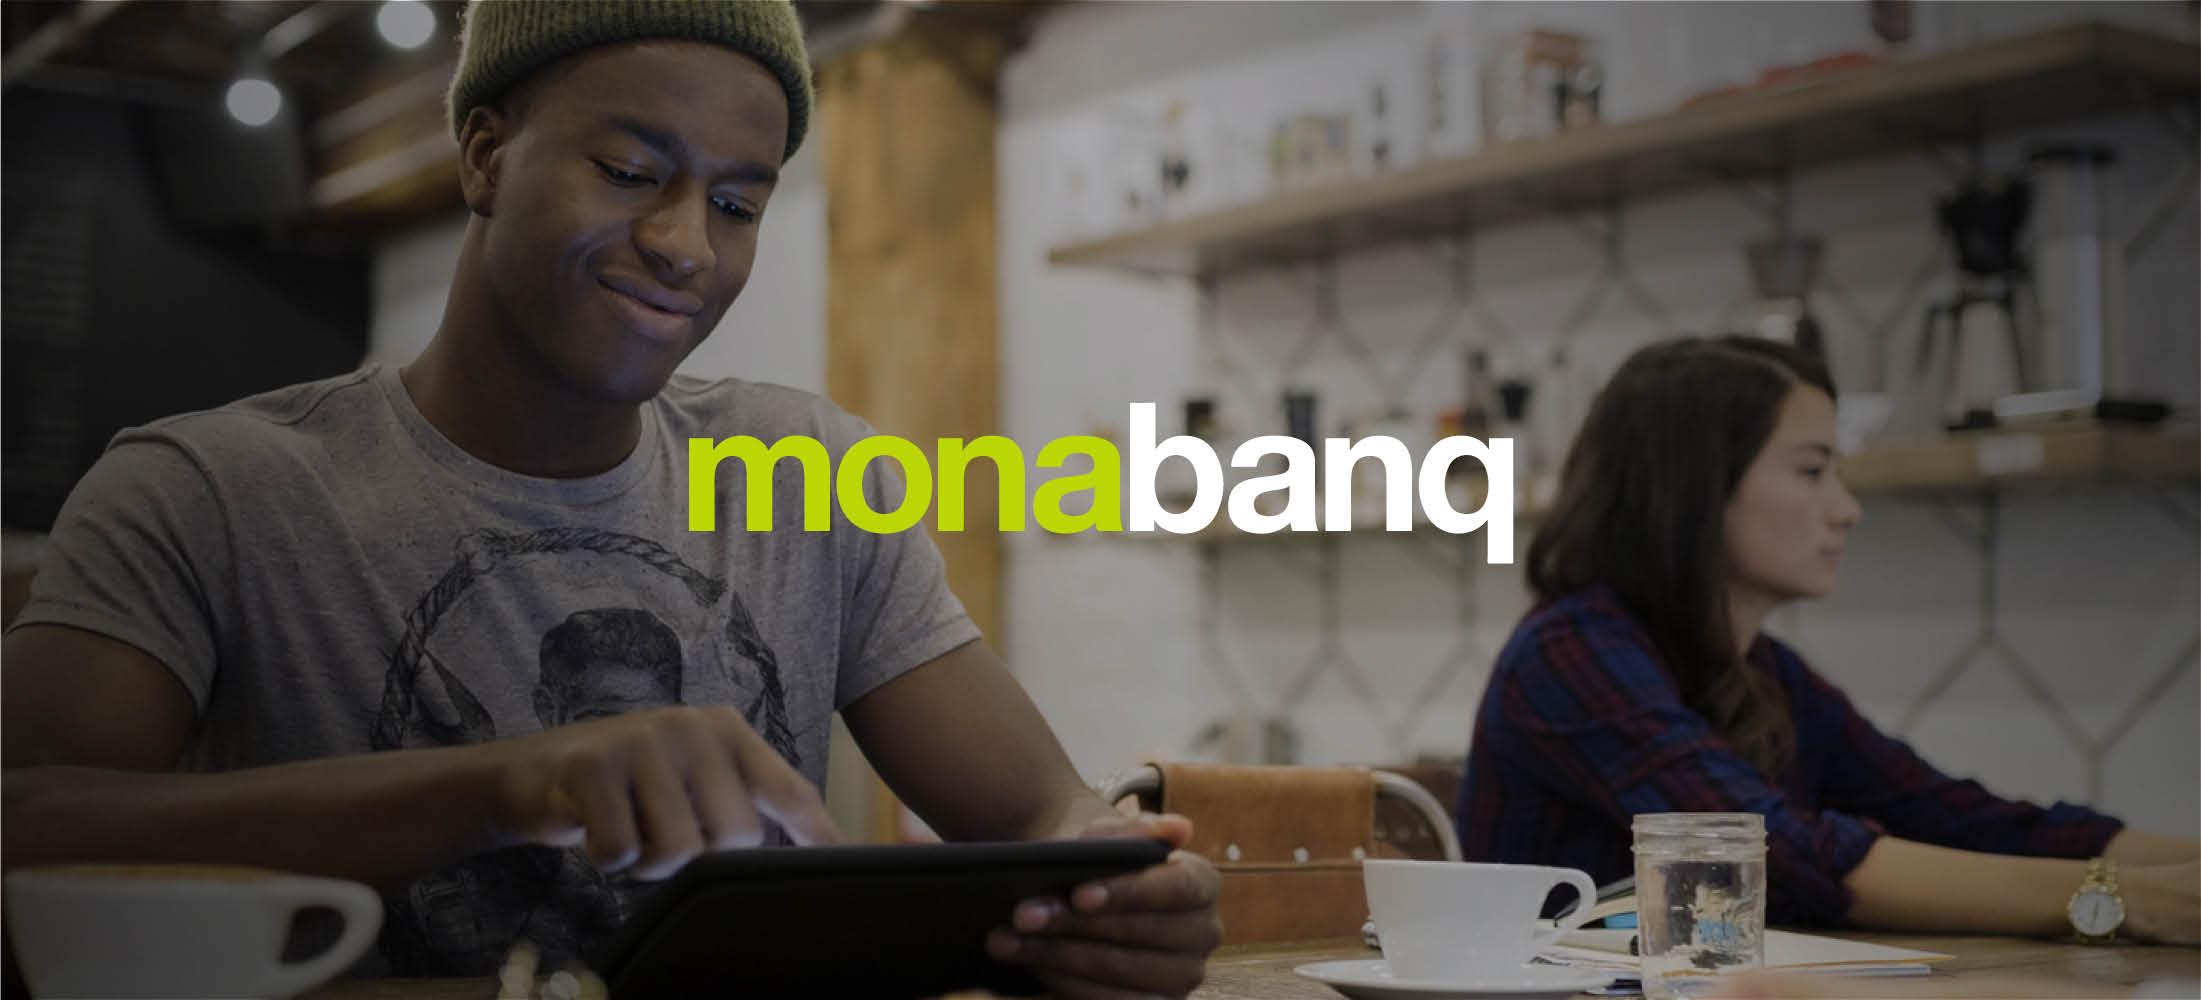 monabanq auto entrepreneur